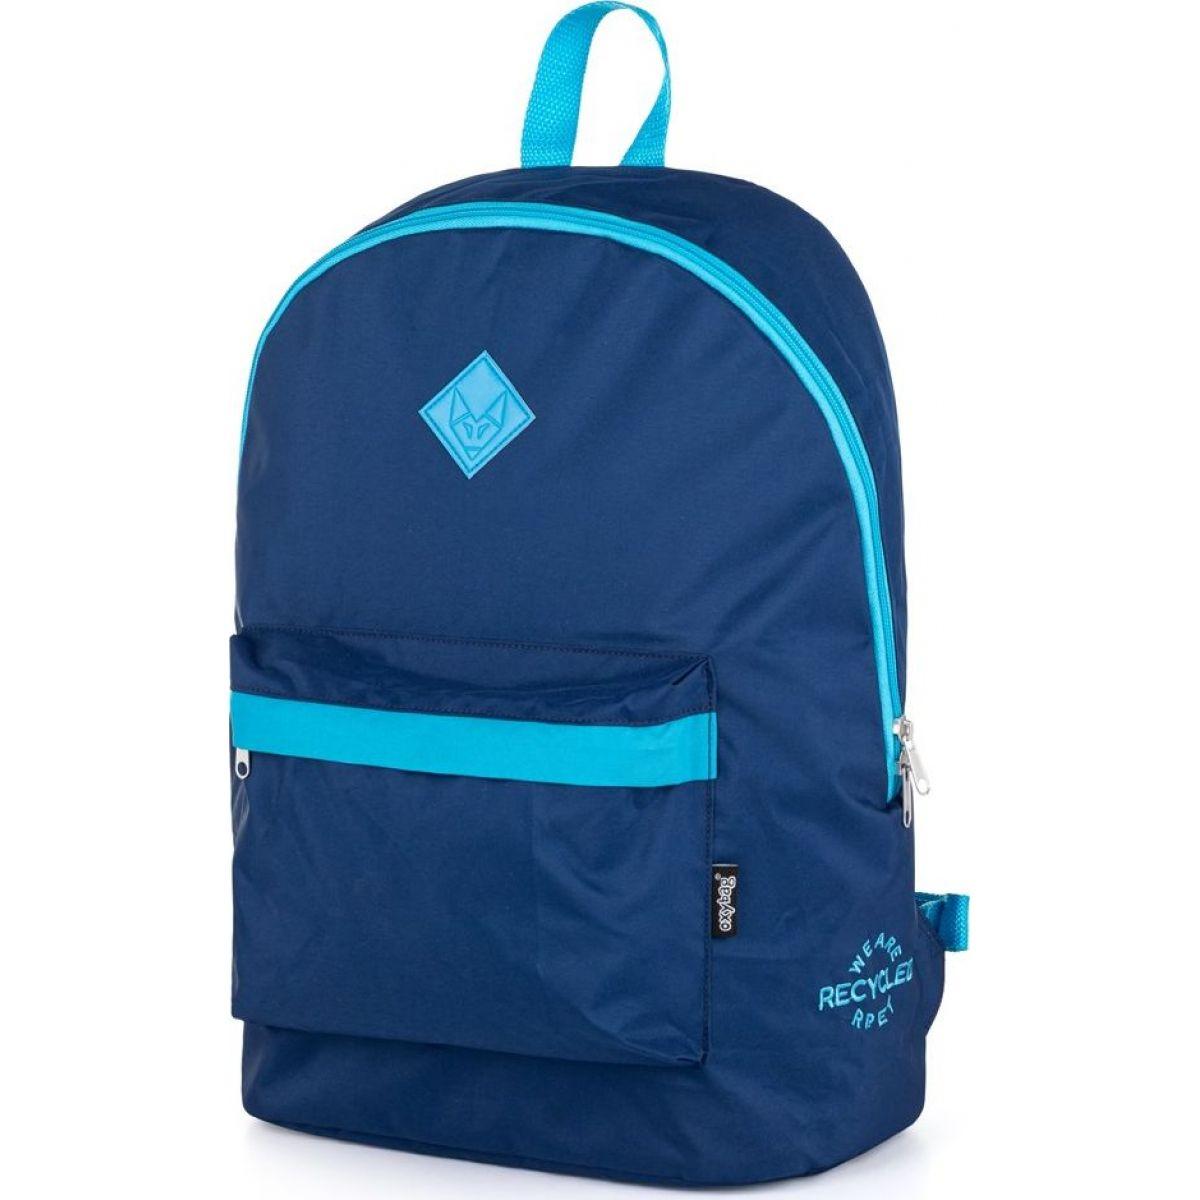 Karton P + P Študentský batoh Oxy Street fashion dark Blue